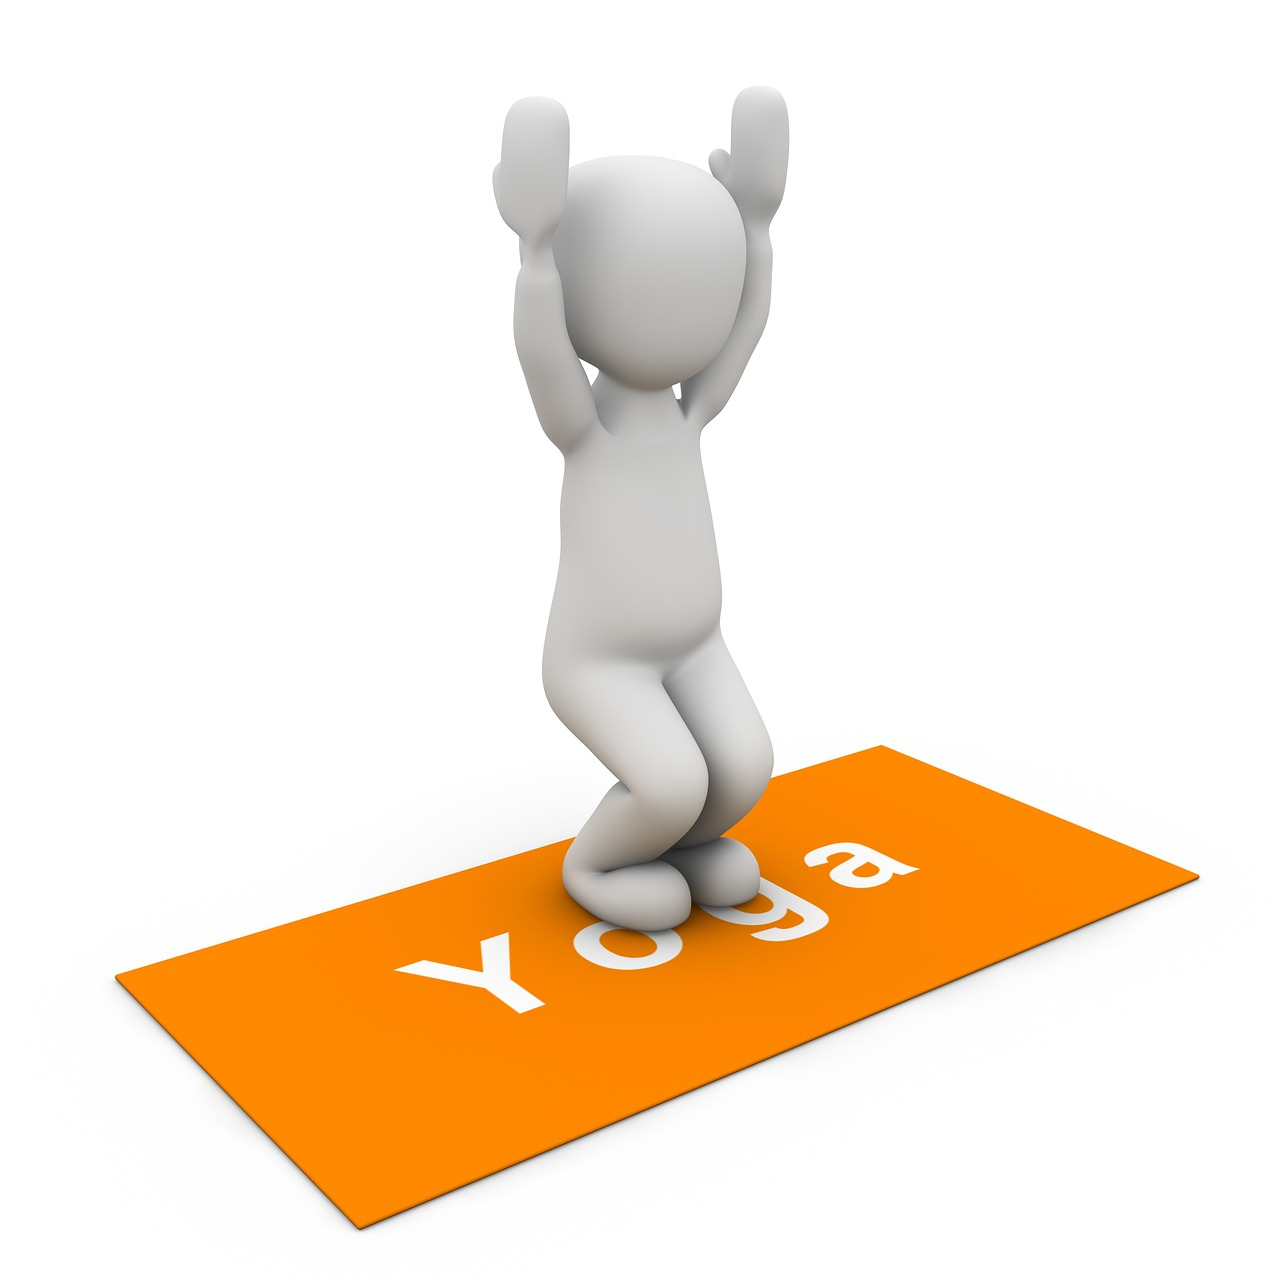 yoga-1027242_1280.jpg